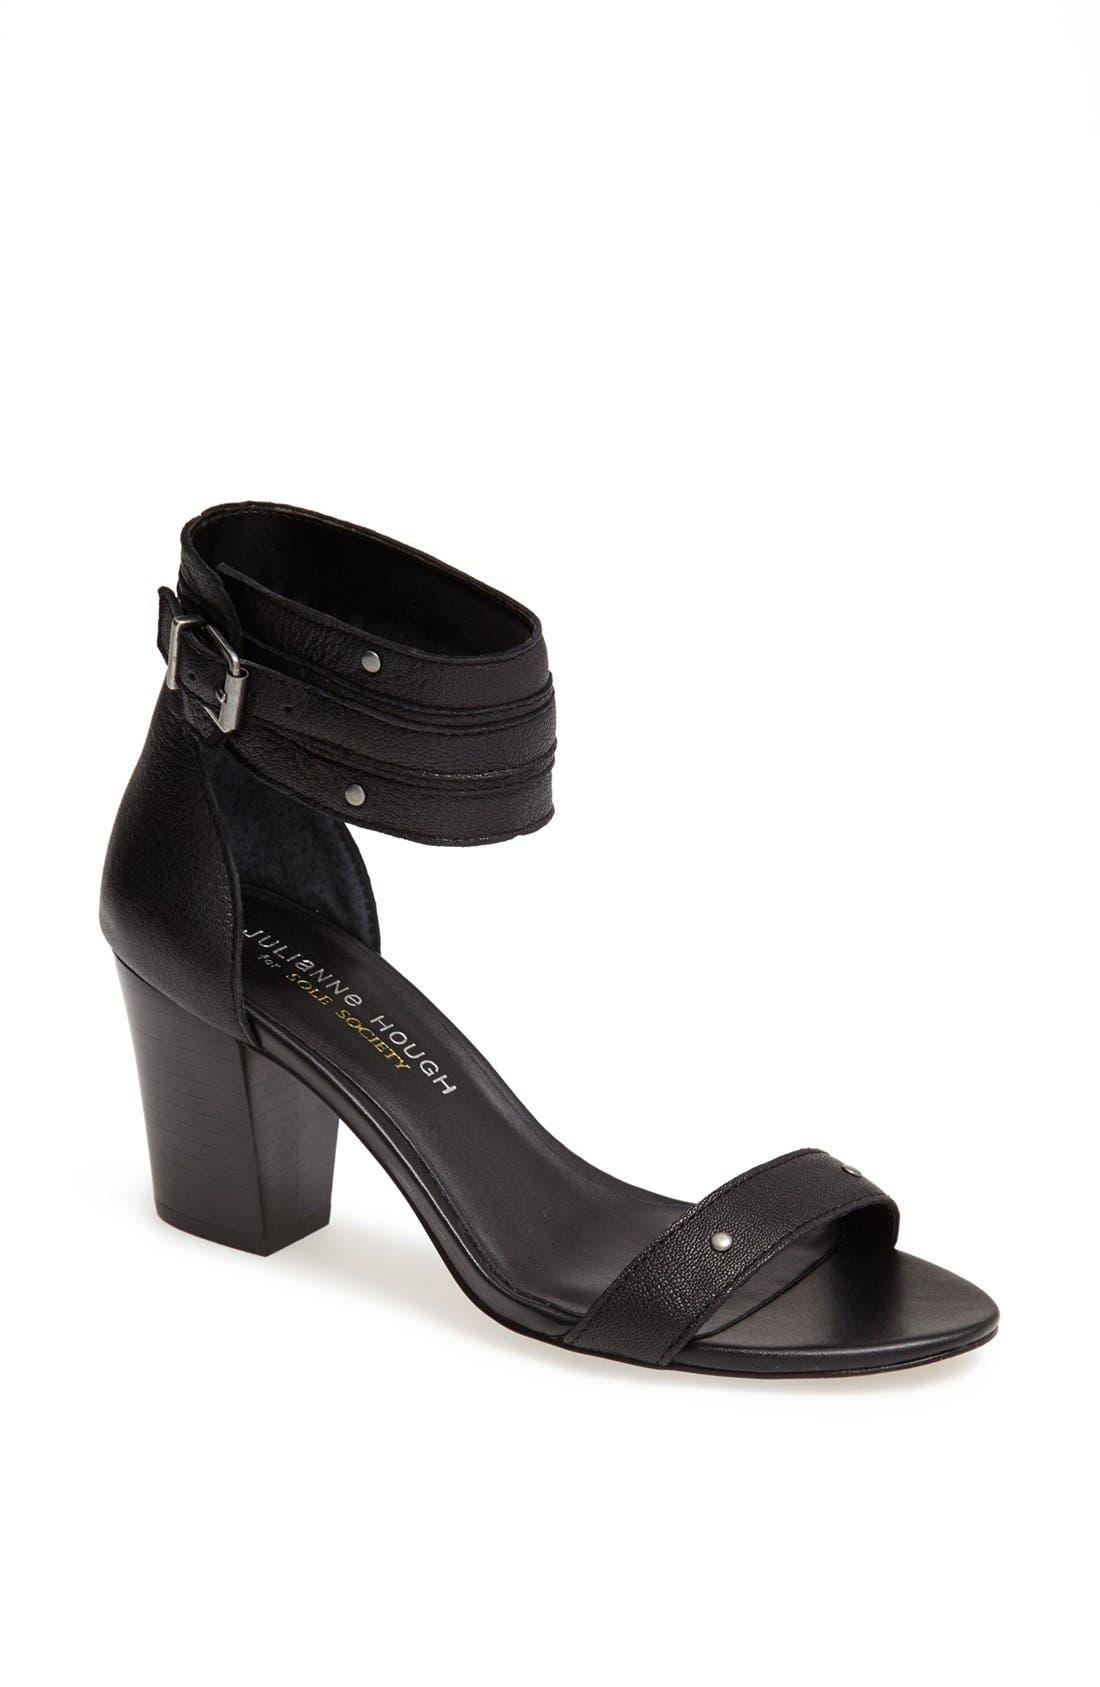 Main Image - Julianne Hough for Sole Society 'Rochelle' Sandal